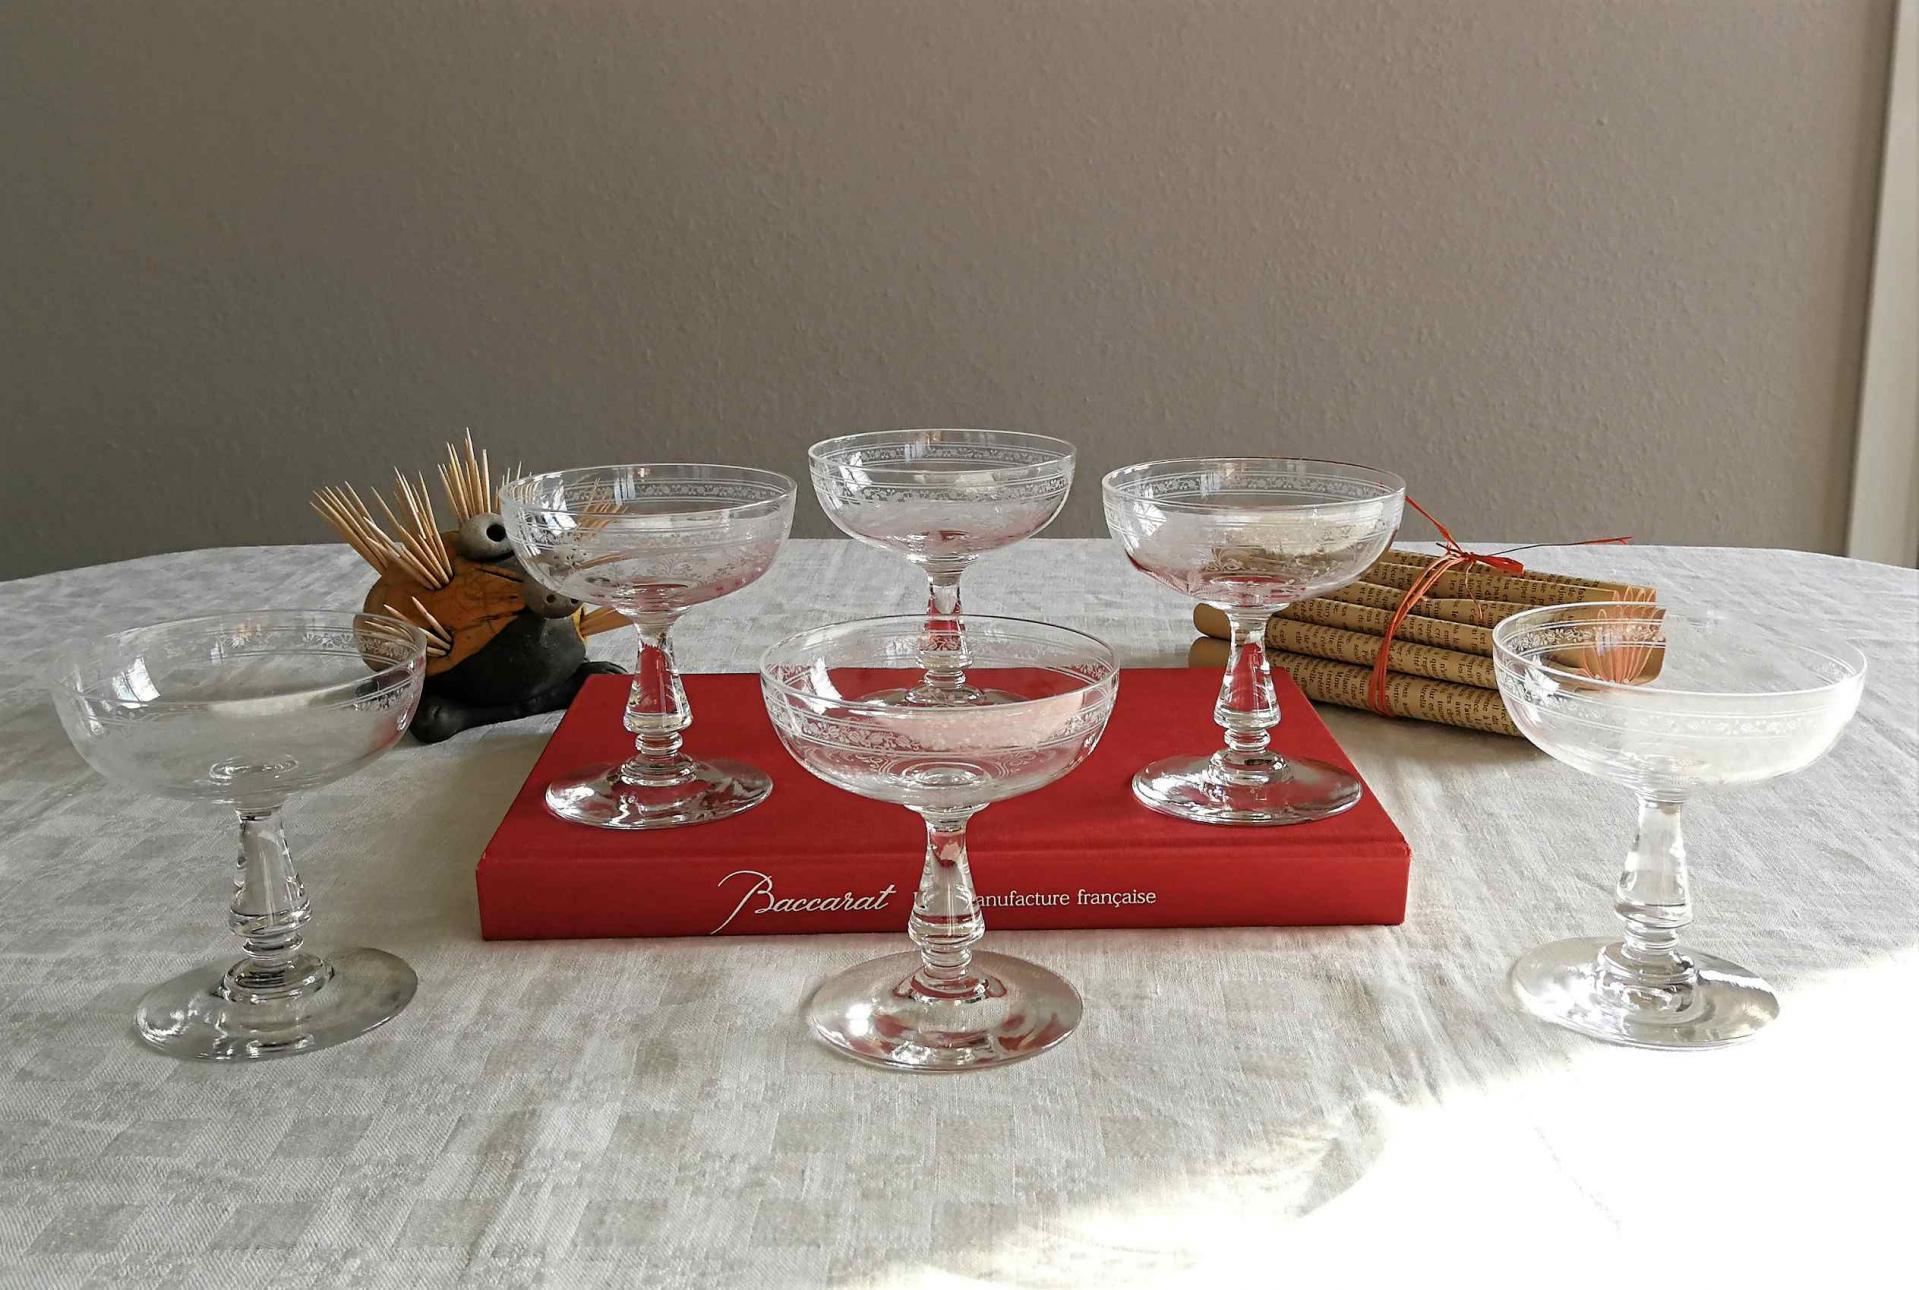 Verre Baccarat cristal, service Fougères. Prestivilege